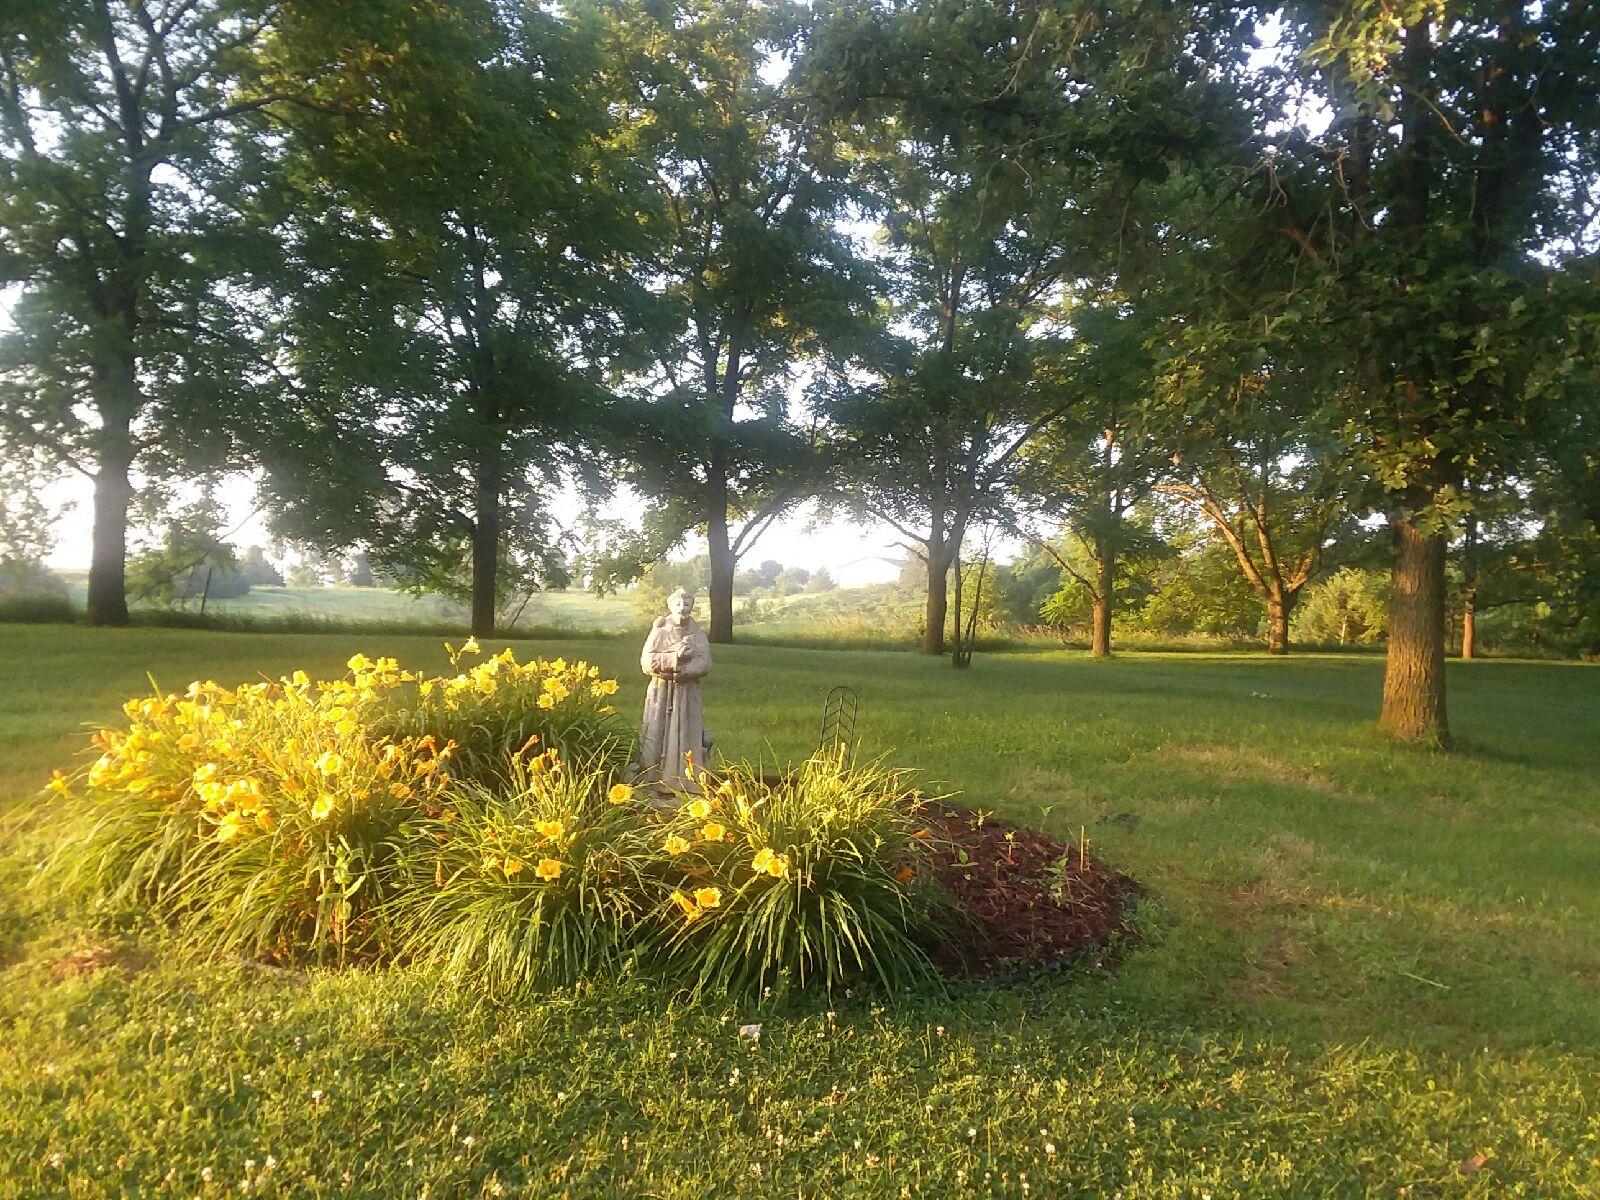 St. Francis flower garden at the Metta Meditation Retreat Center